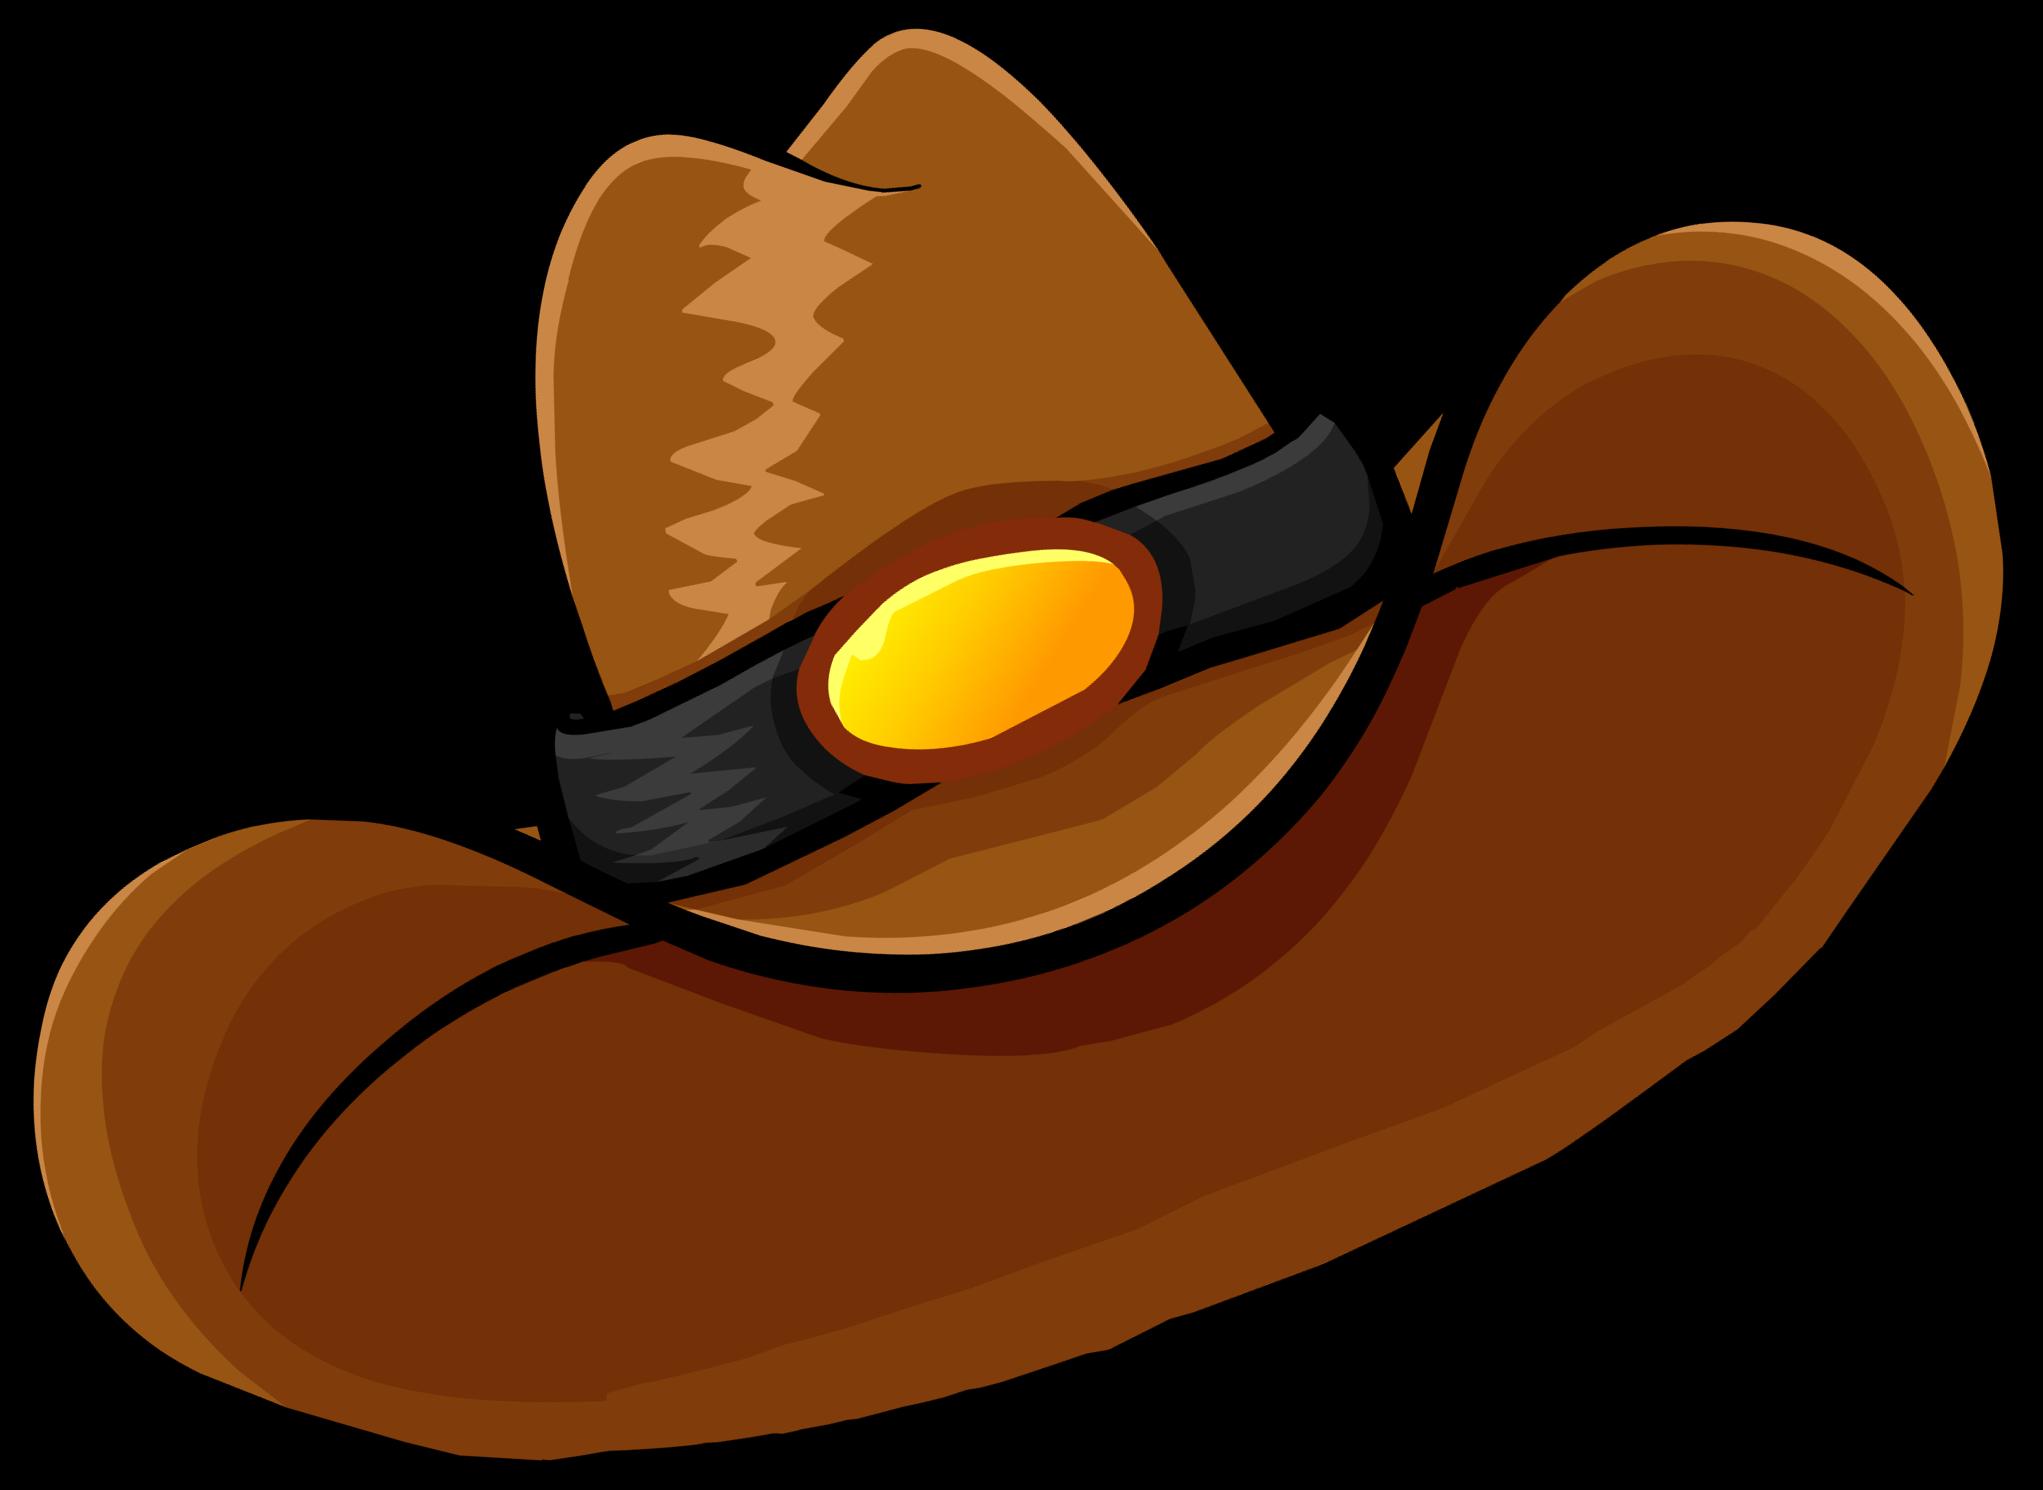 2043x1490 Cowboy Hat Png Transparent Images Png All